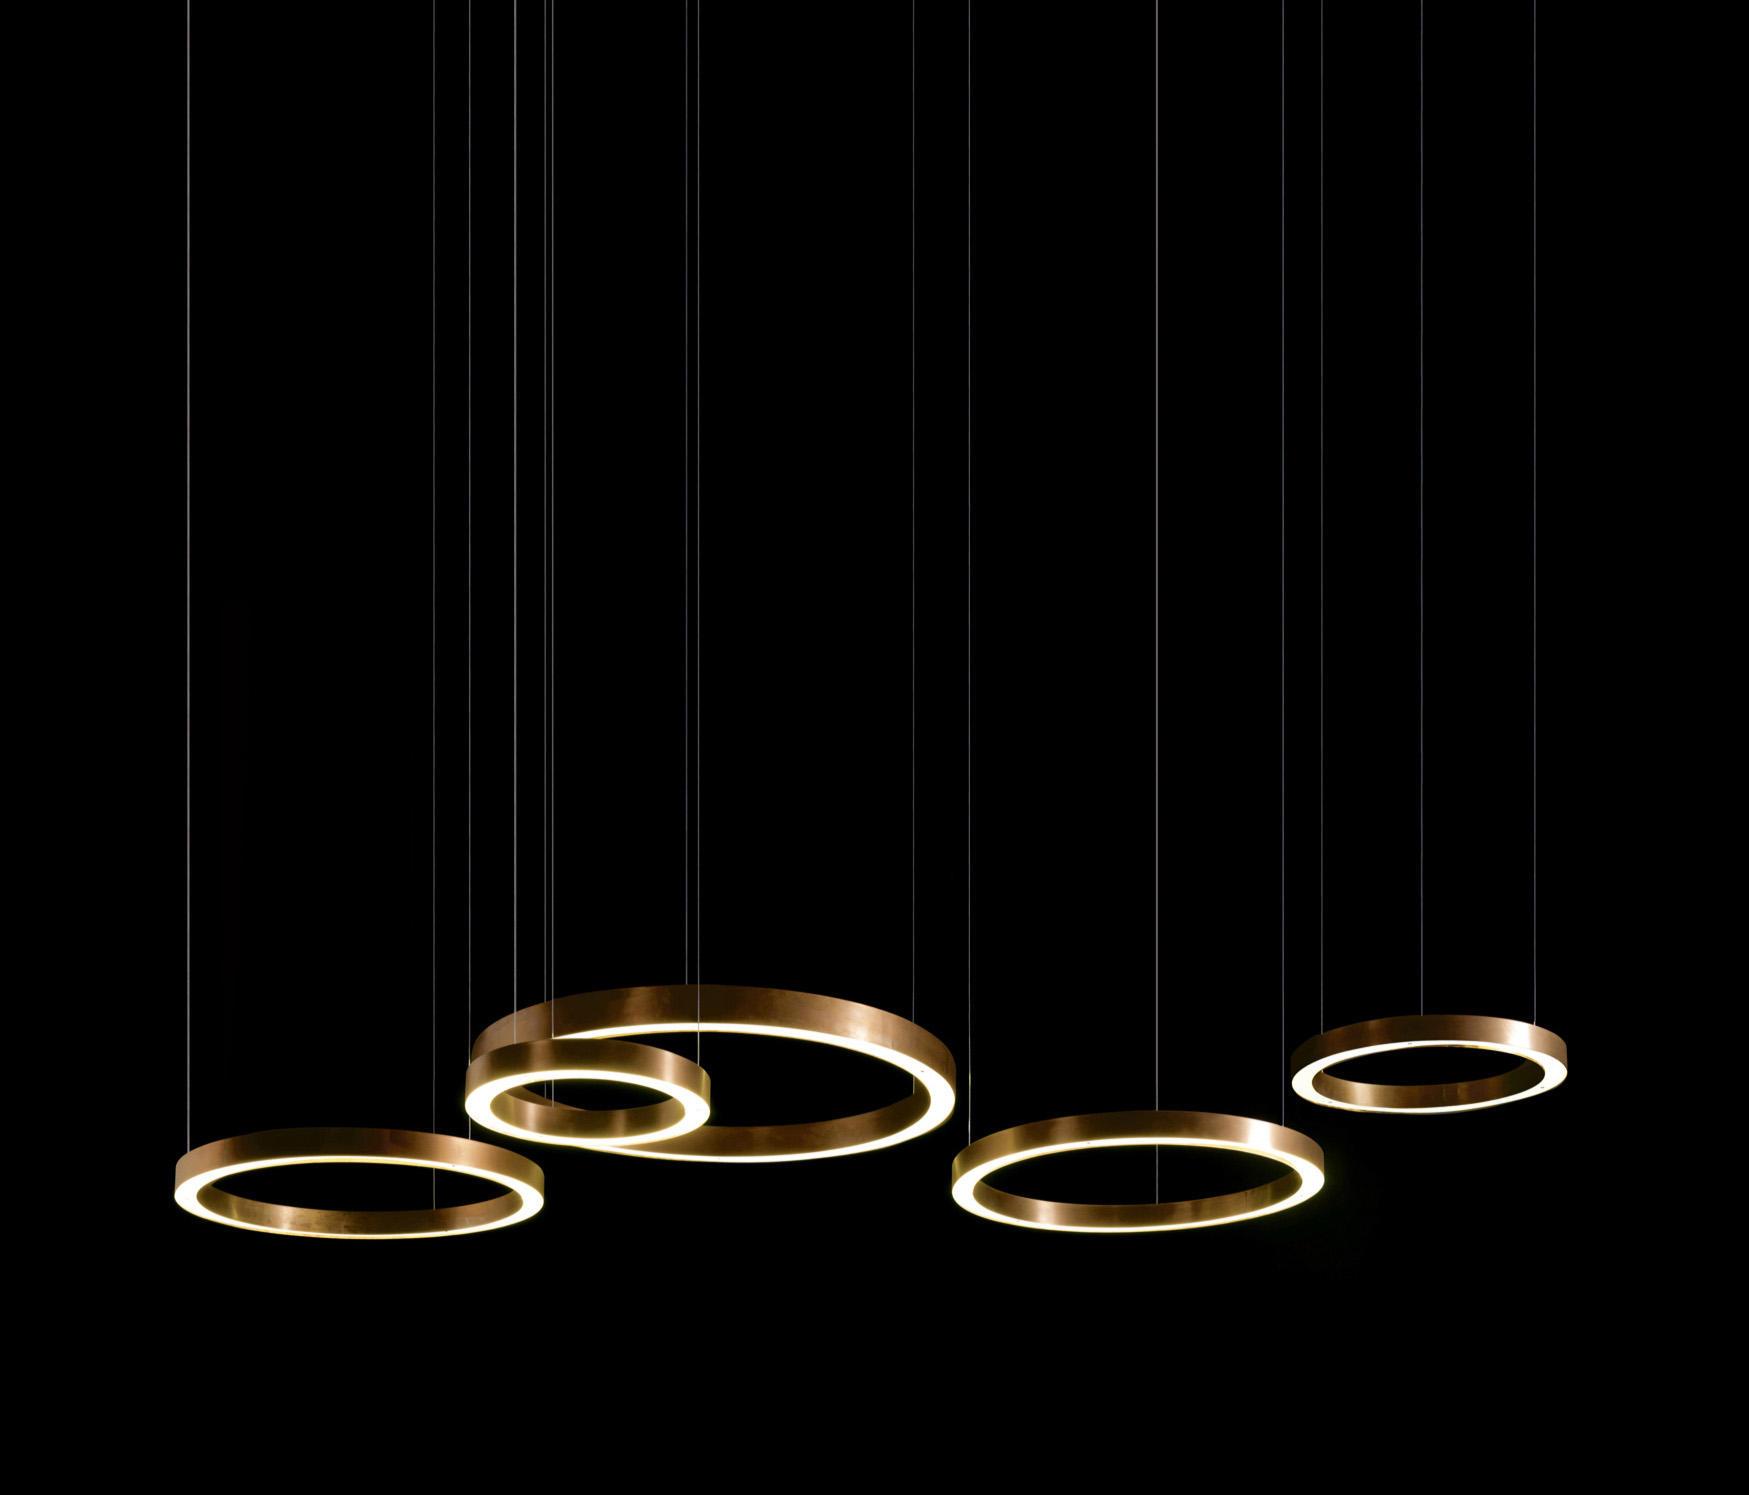 Kitchen Lights Over Island Light Ring Horizontal Suspended Lights From Henge